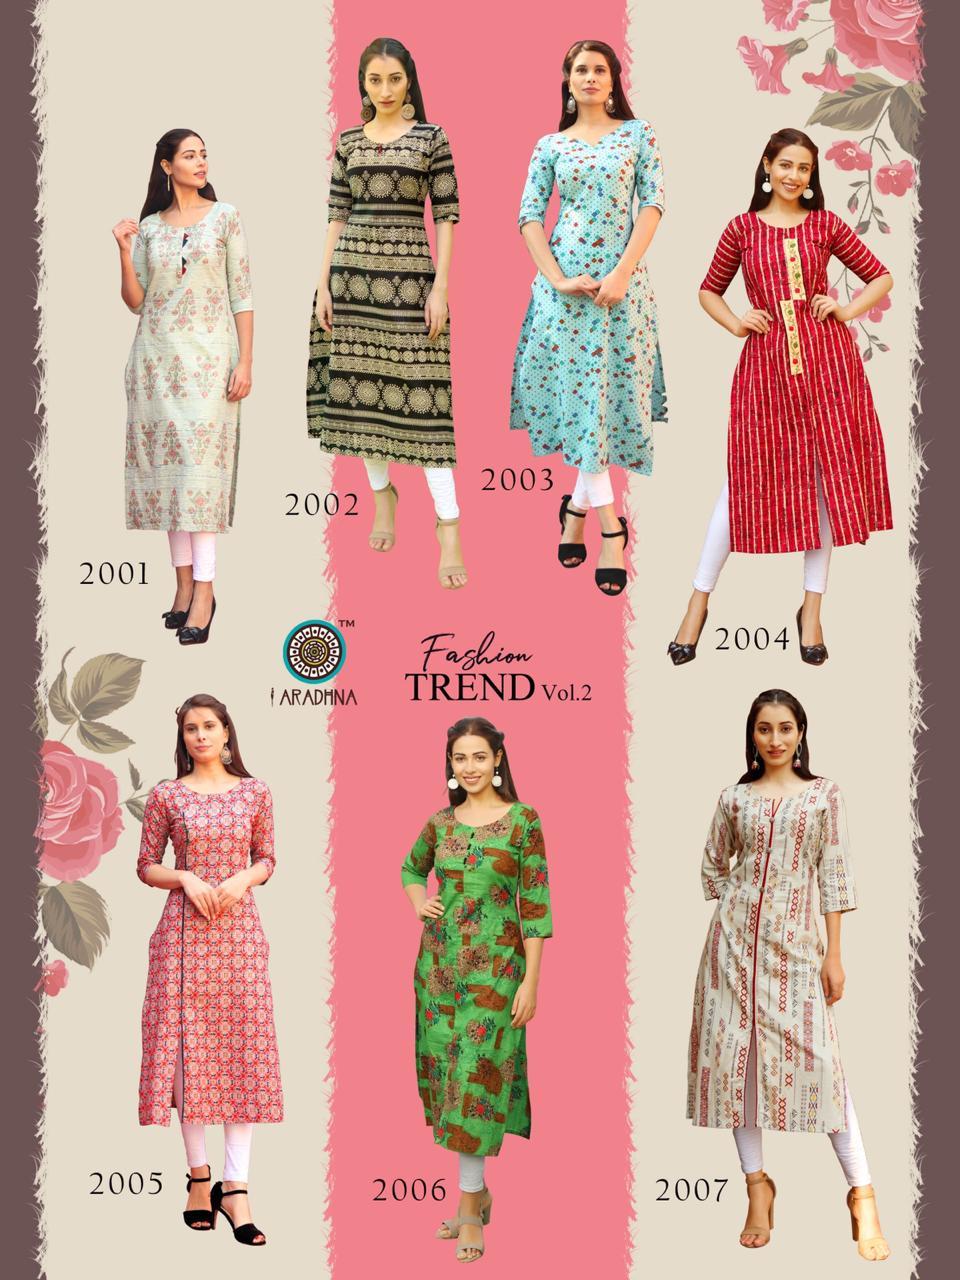 Pk Fashion Trend Vol 2 Kurti Wholesale Catalog 7 Pcs 10 - Pk Fashion Trend Vol 2 Kurti Wholesale Catalog 7 Pcs